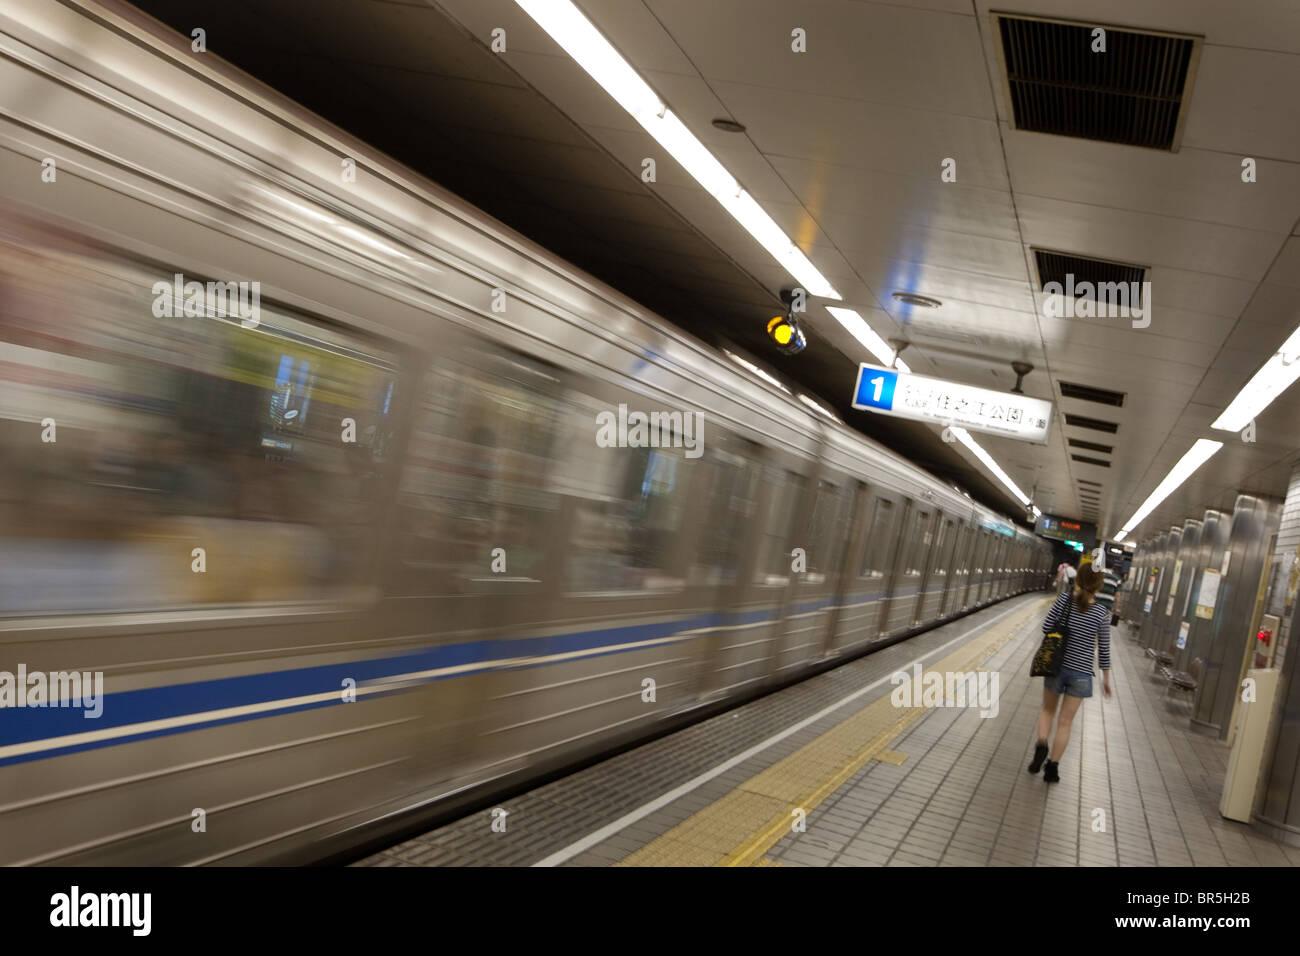 Underground metro transportation system in Osaka, Japan